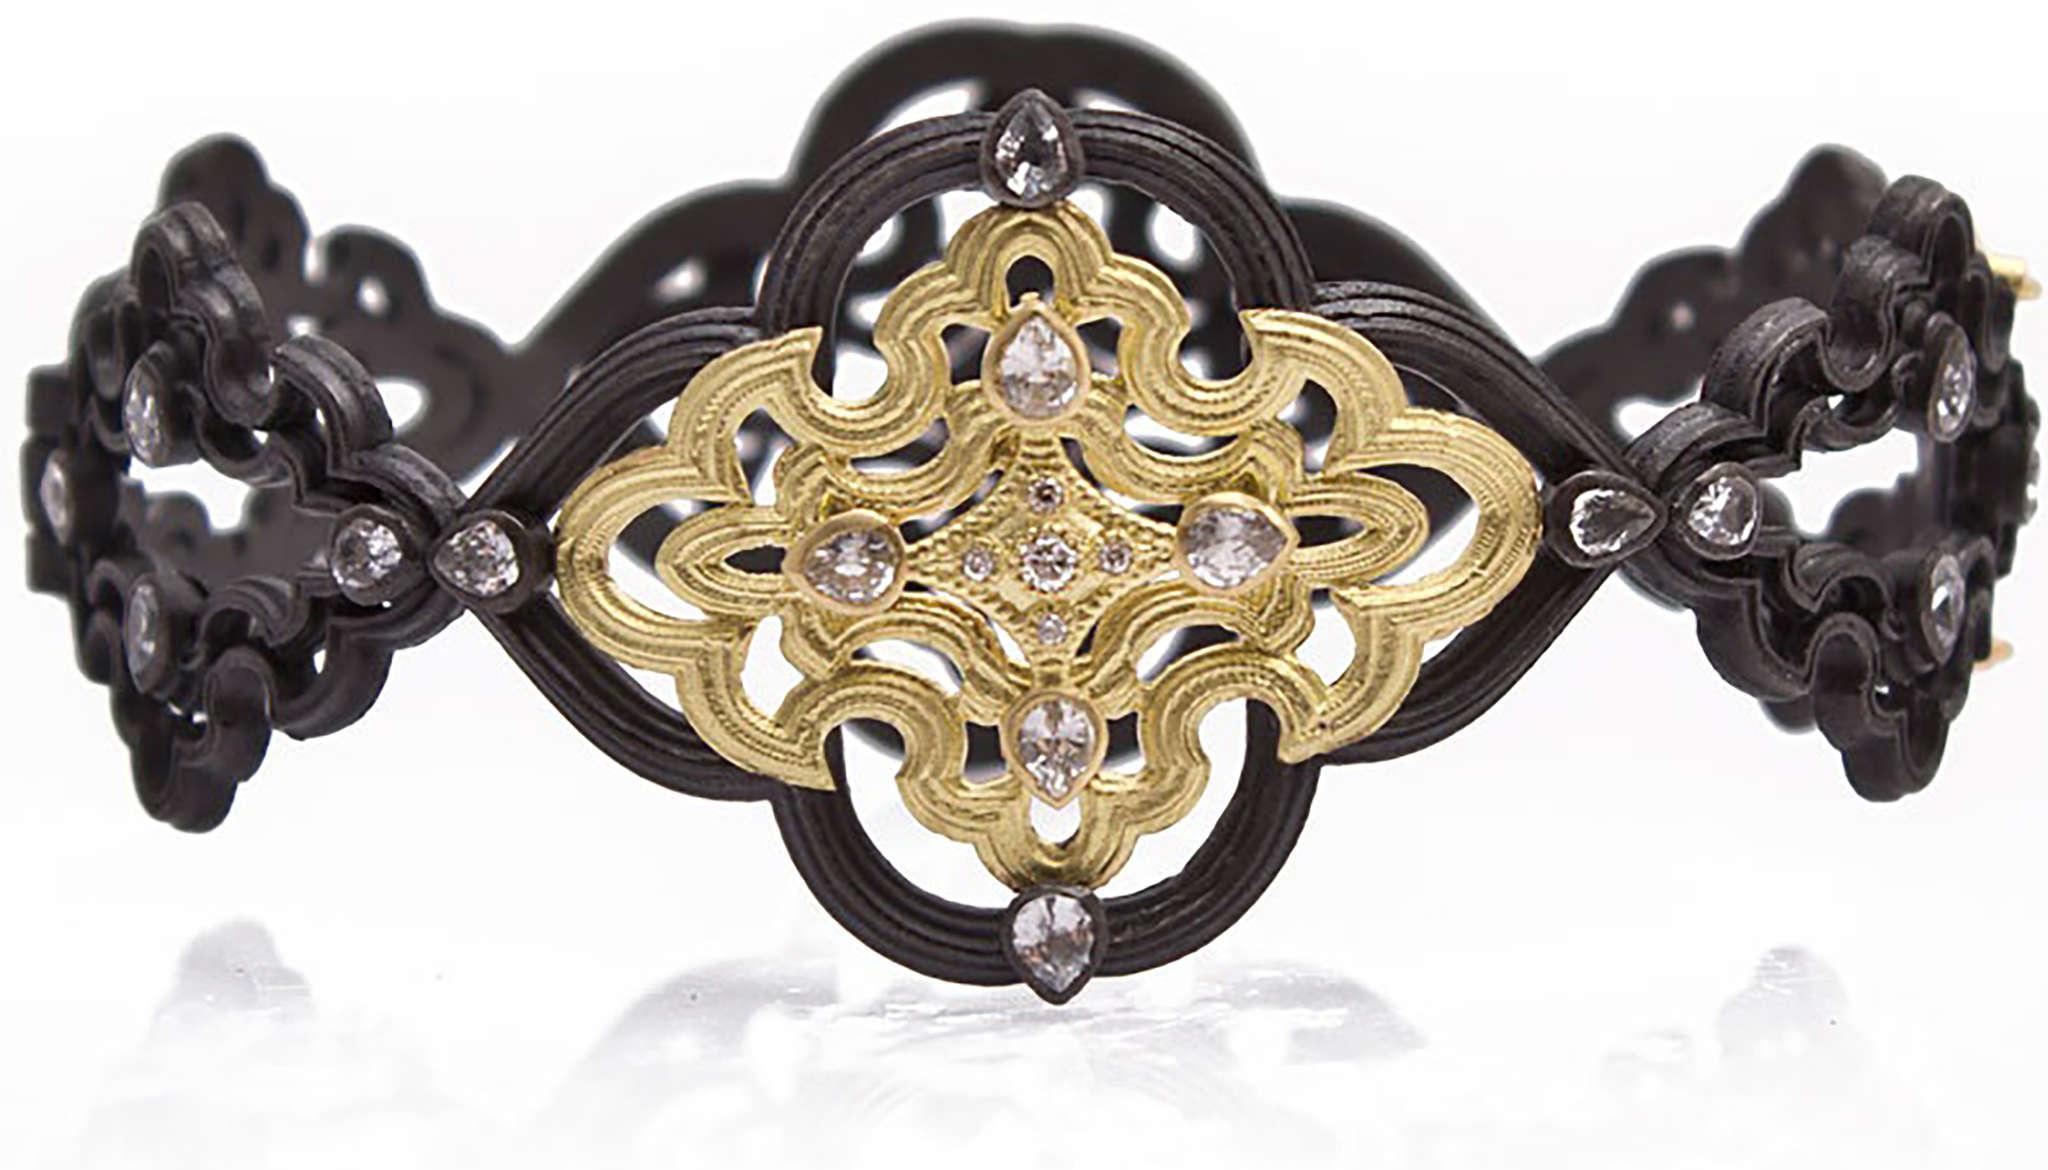 Rose gold open-bangle bracelet with diamond design, Casato, available at Bernie Robbins Jewelers in Villanova.